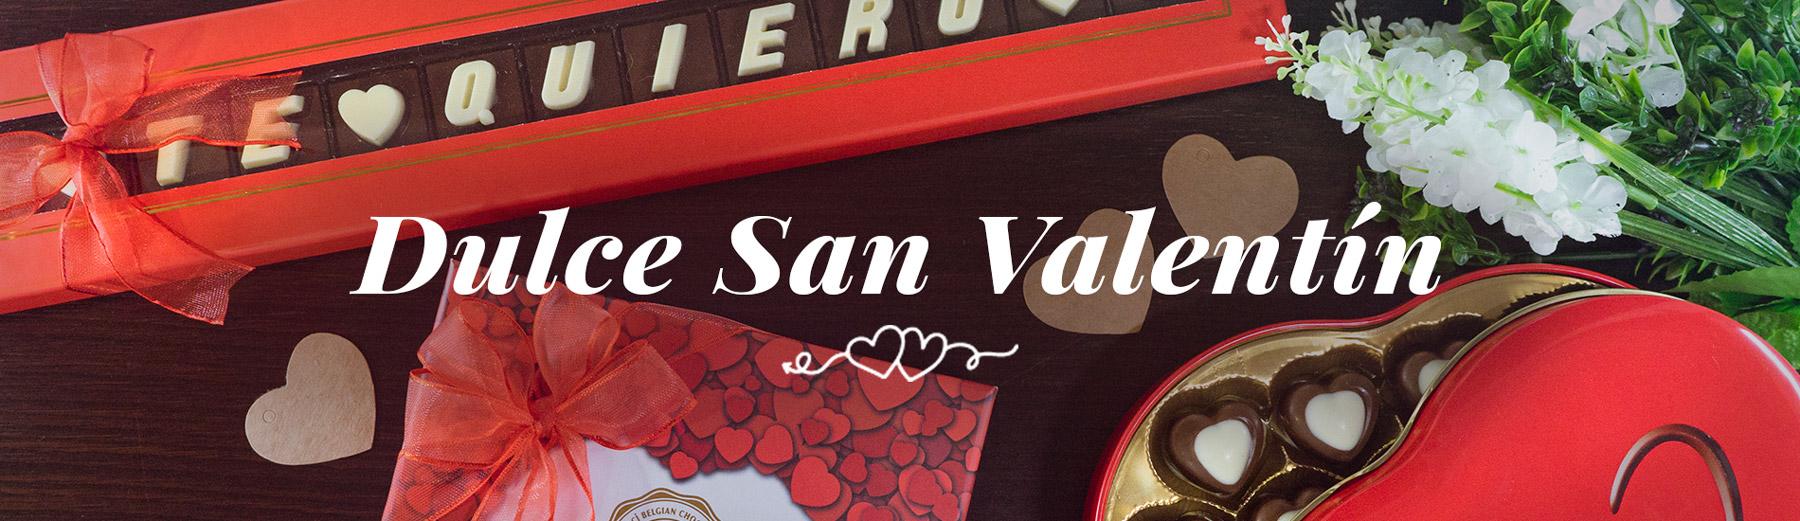 Enviar bombones a domicilio por San Valentín